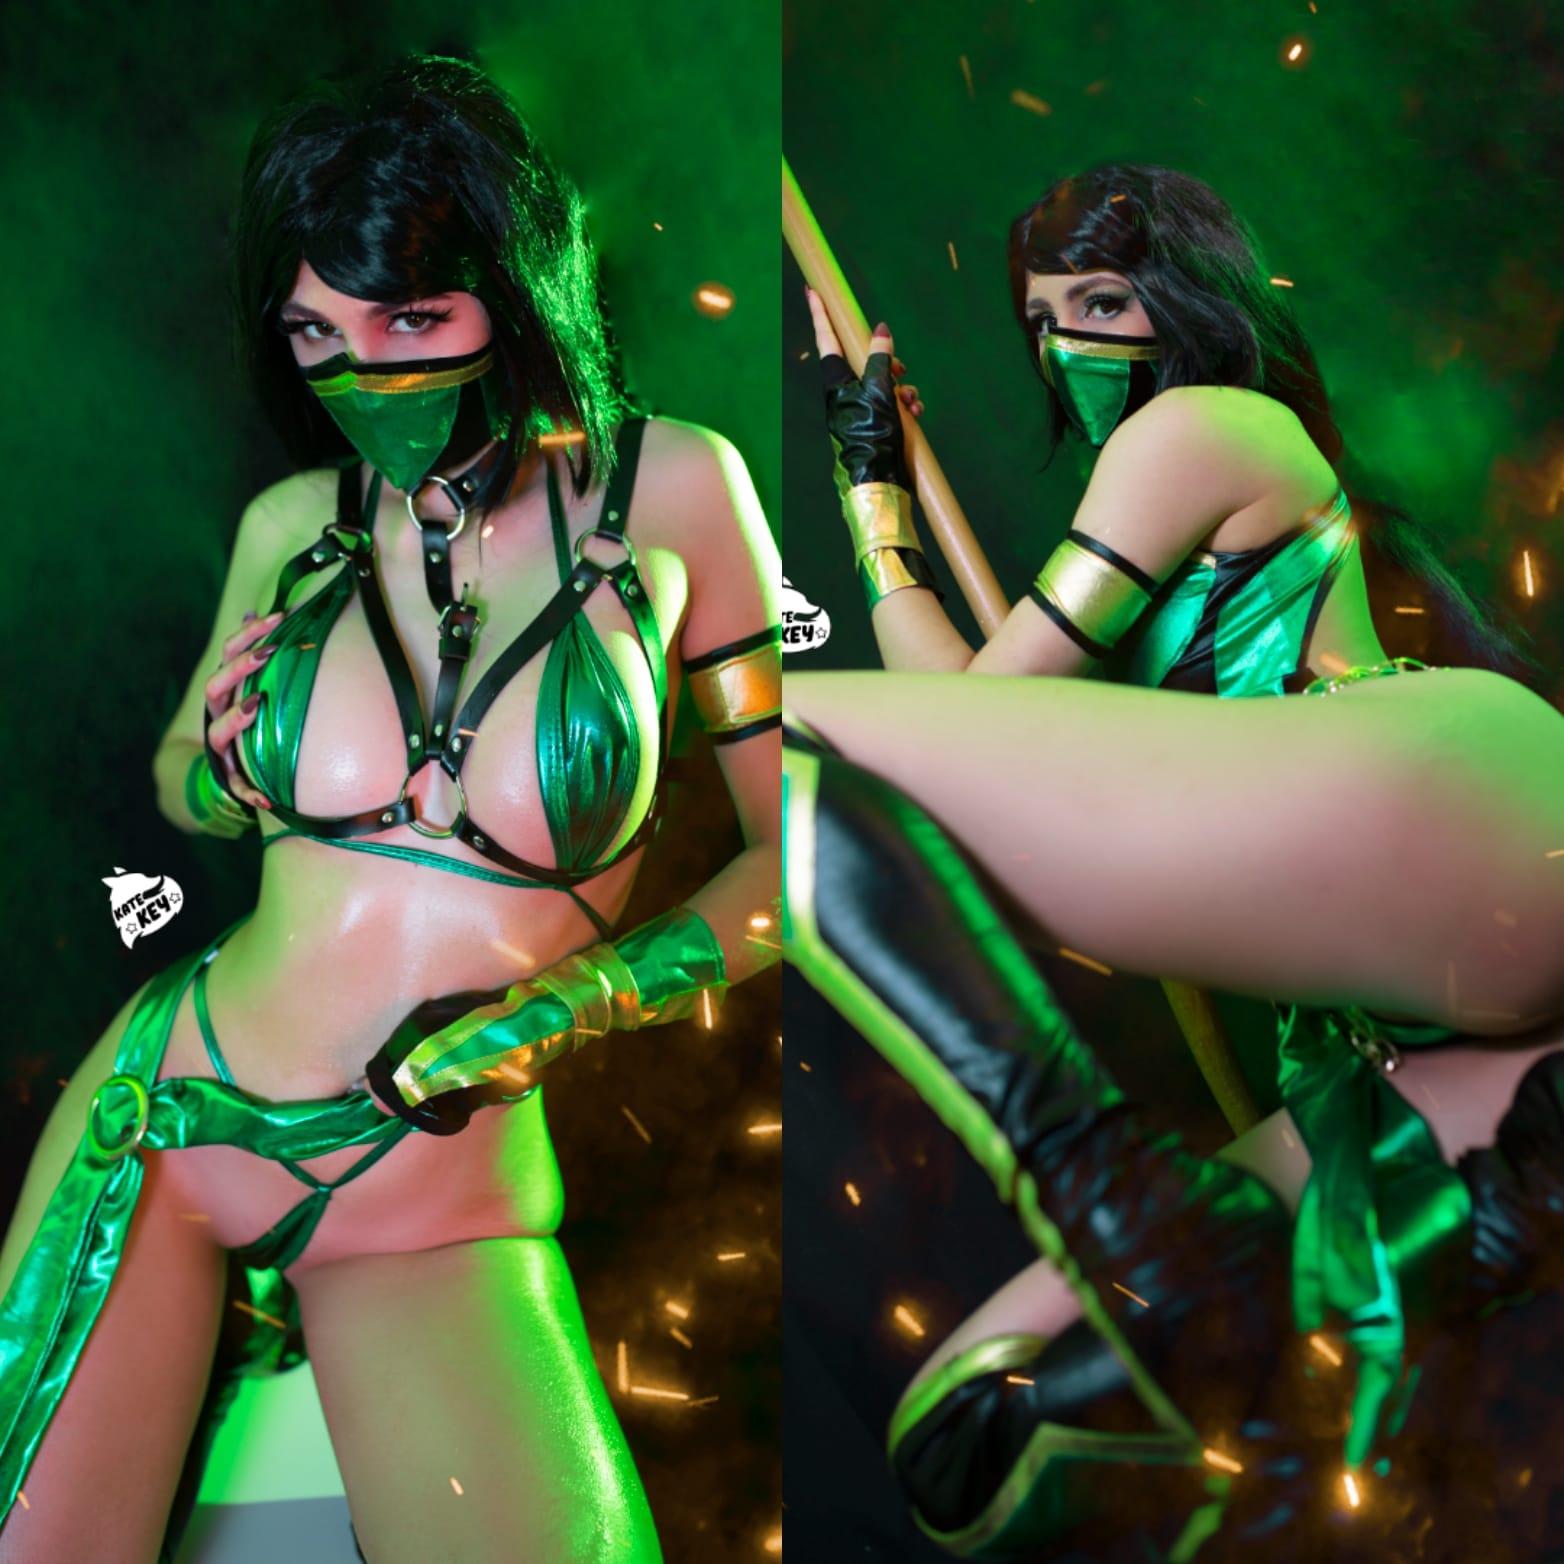 Jade From Mortal Kombat By Kate Key